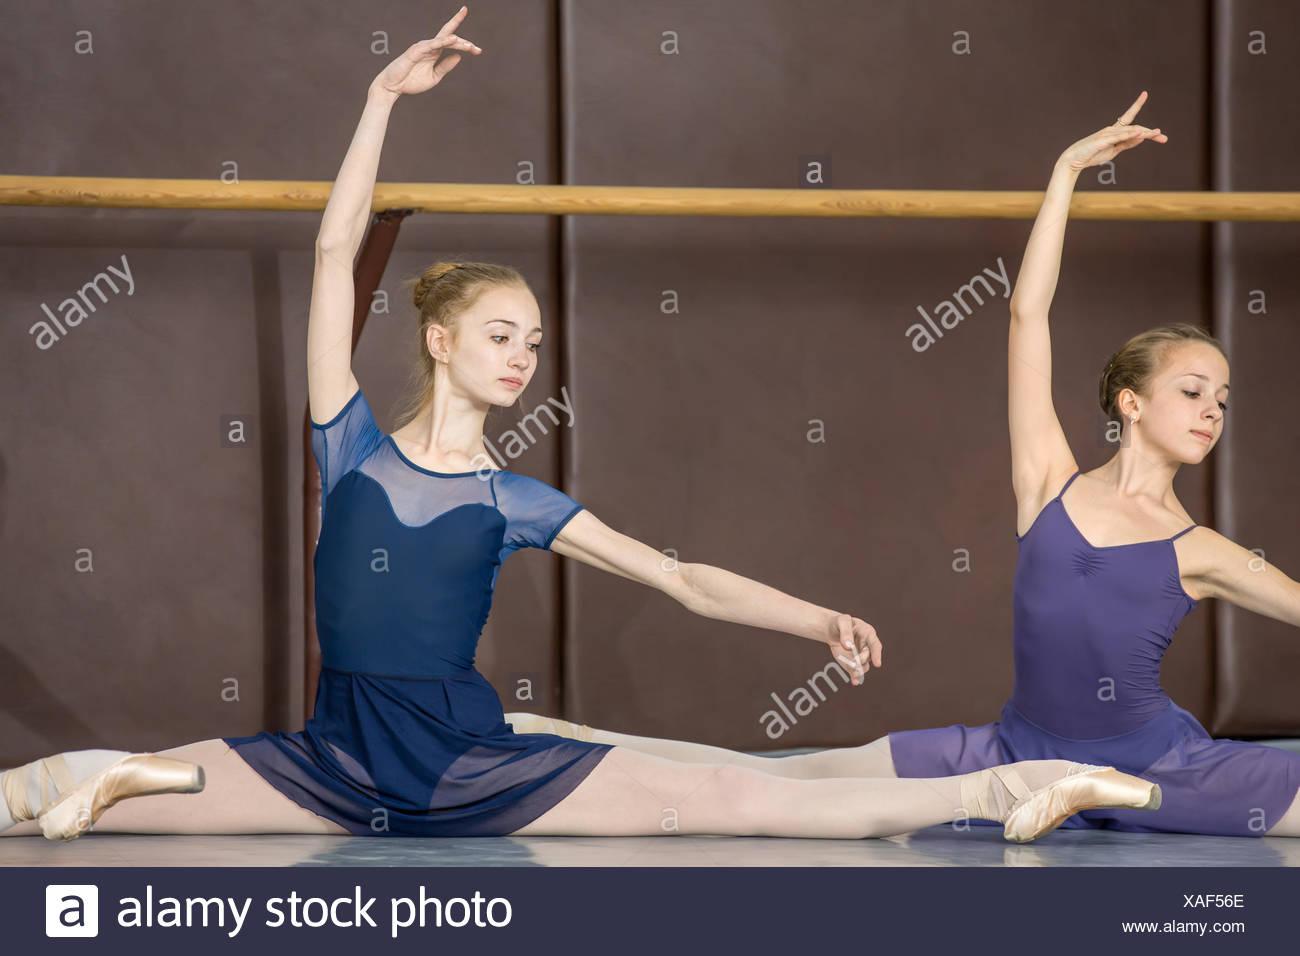 classical choreography - Stock Image